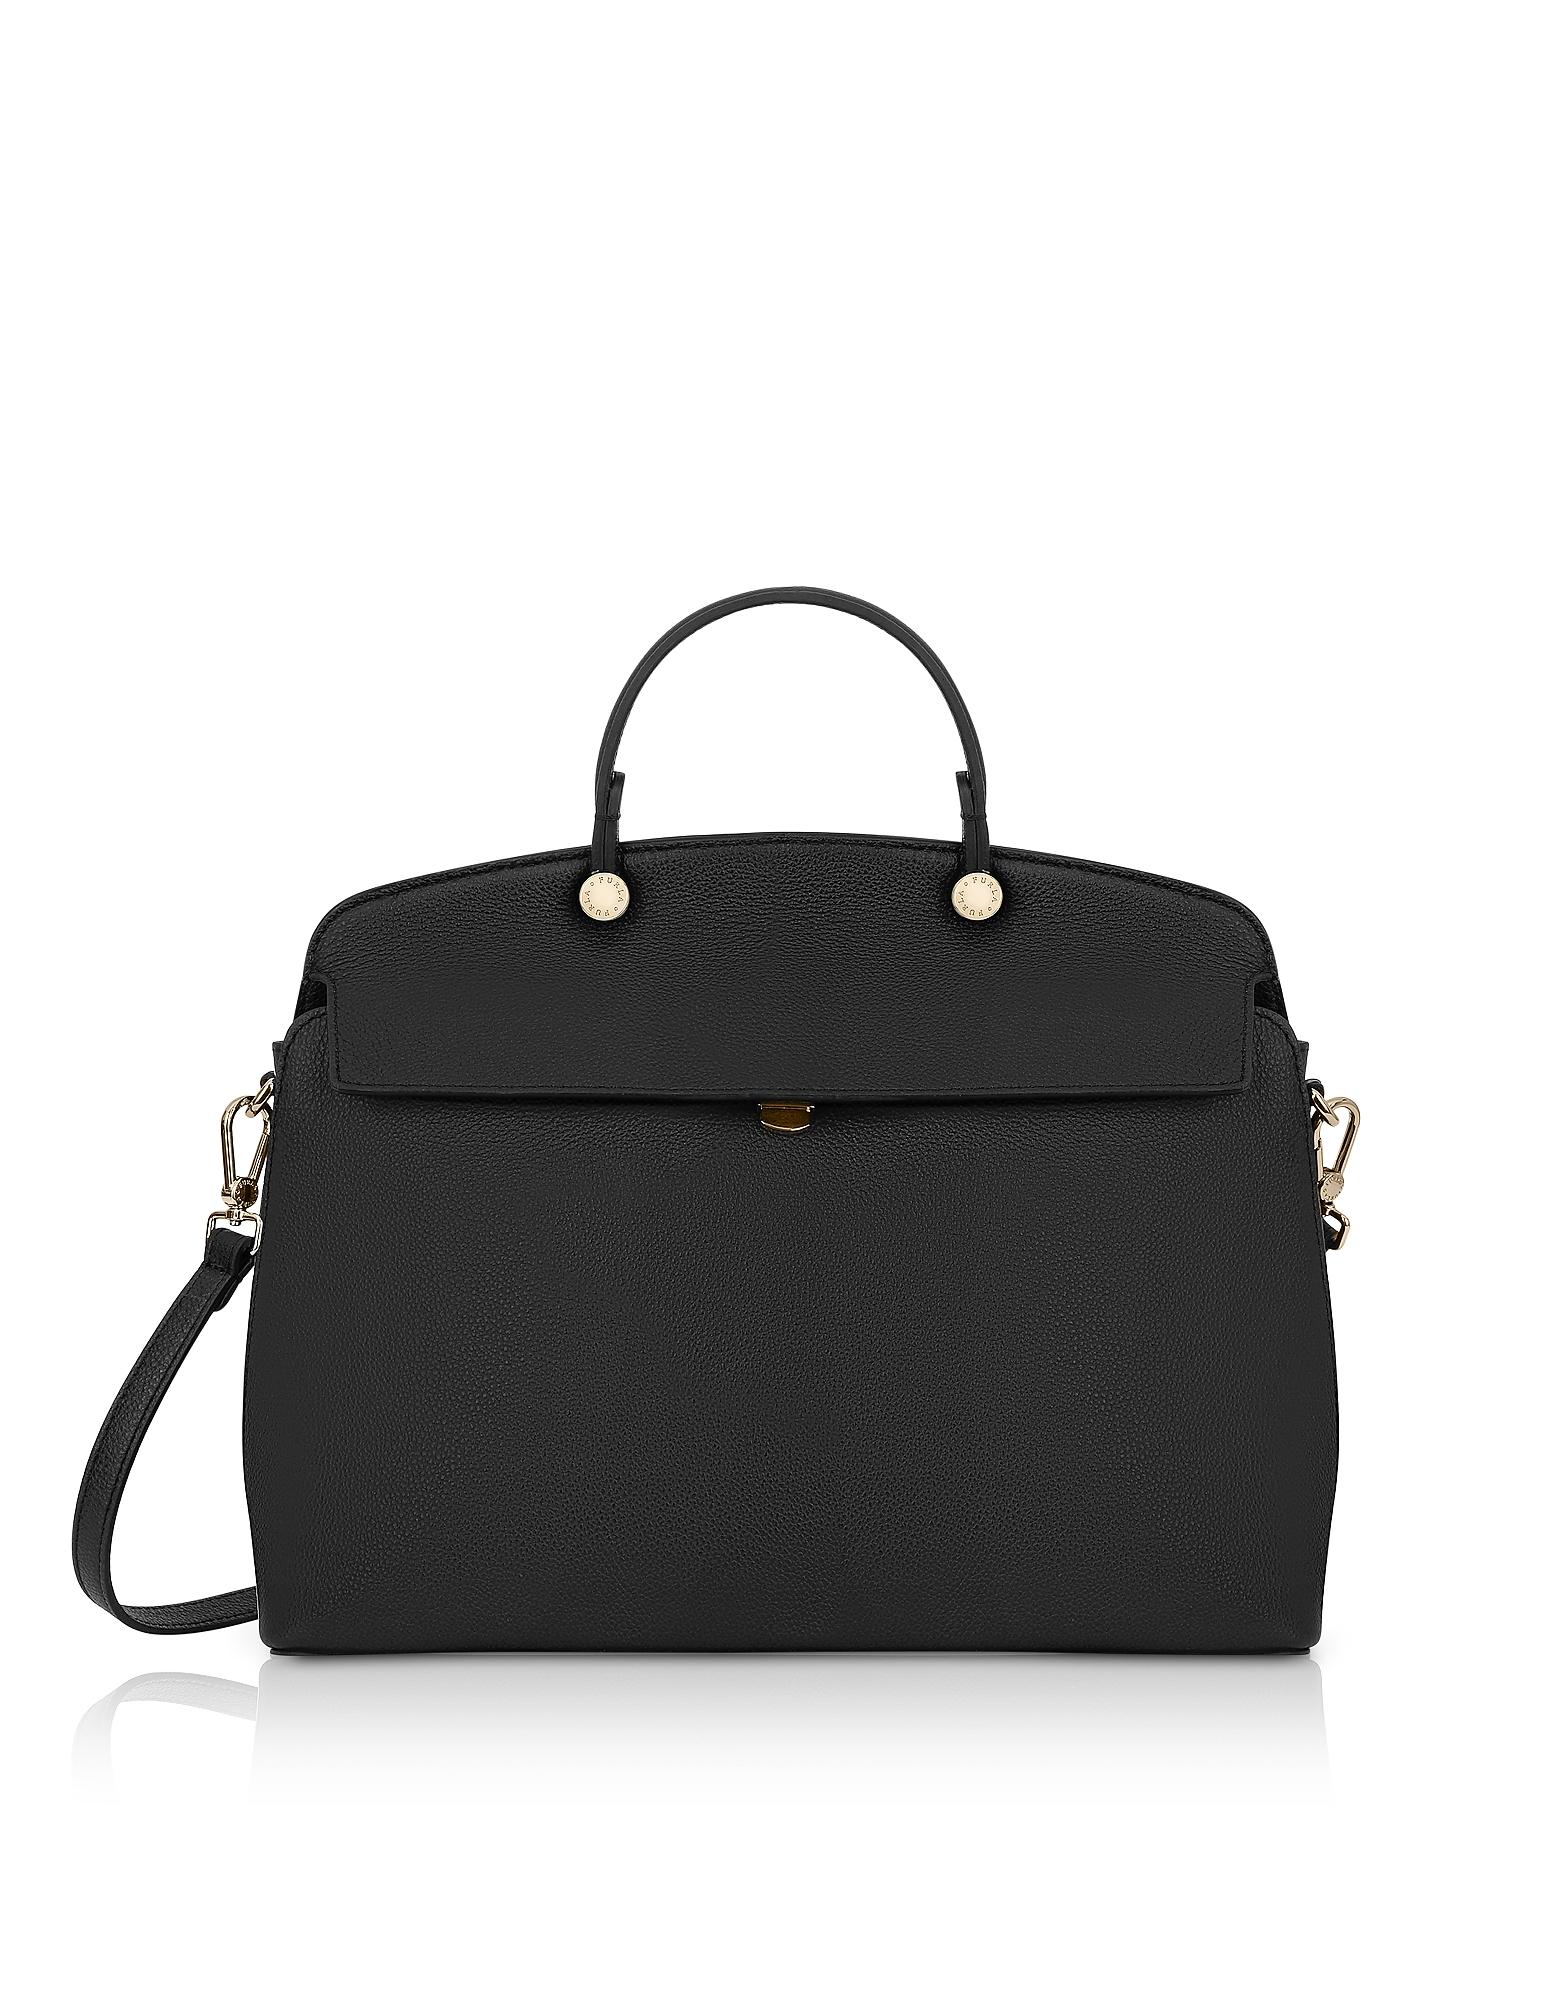 Onyx Cuir Mon Piper Moyen Top Handle Satchel Bag